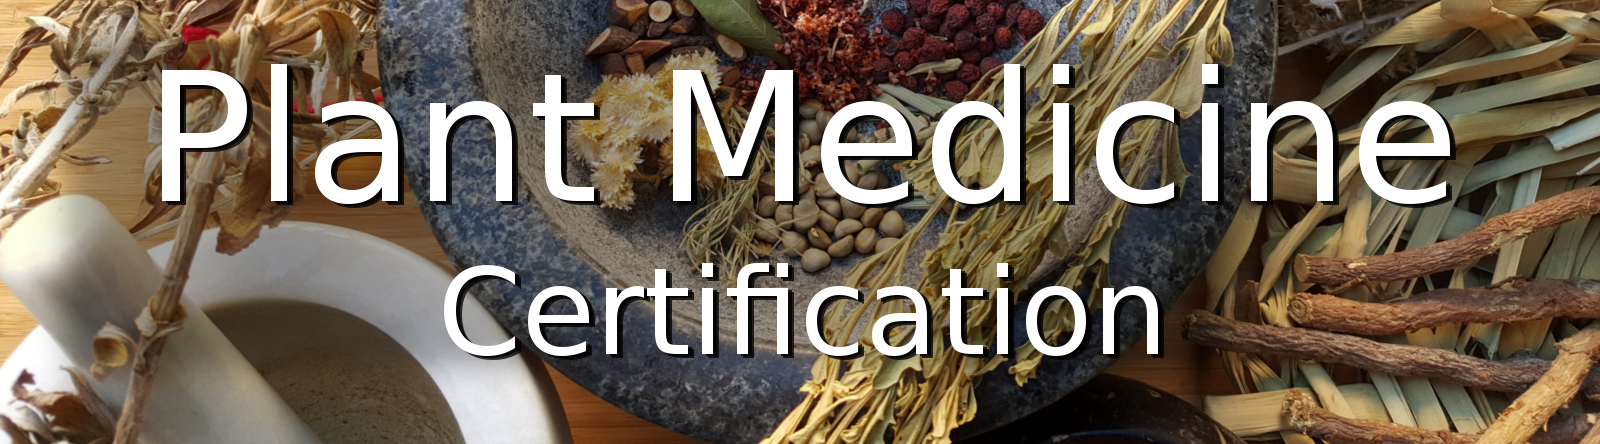 Plant Medicine Certification